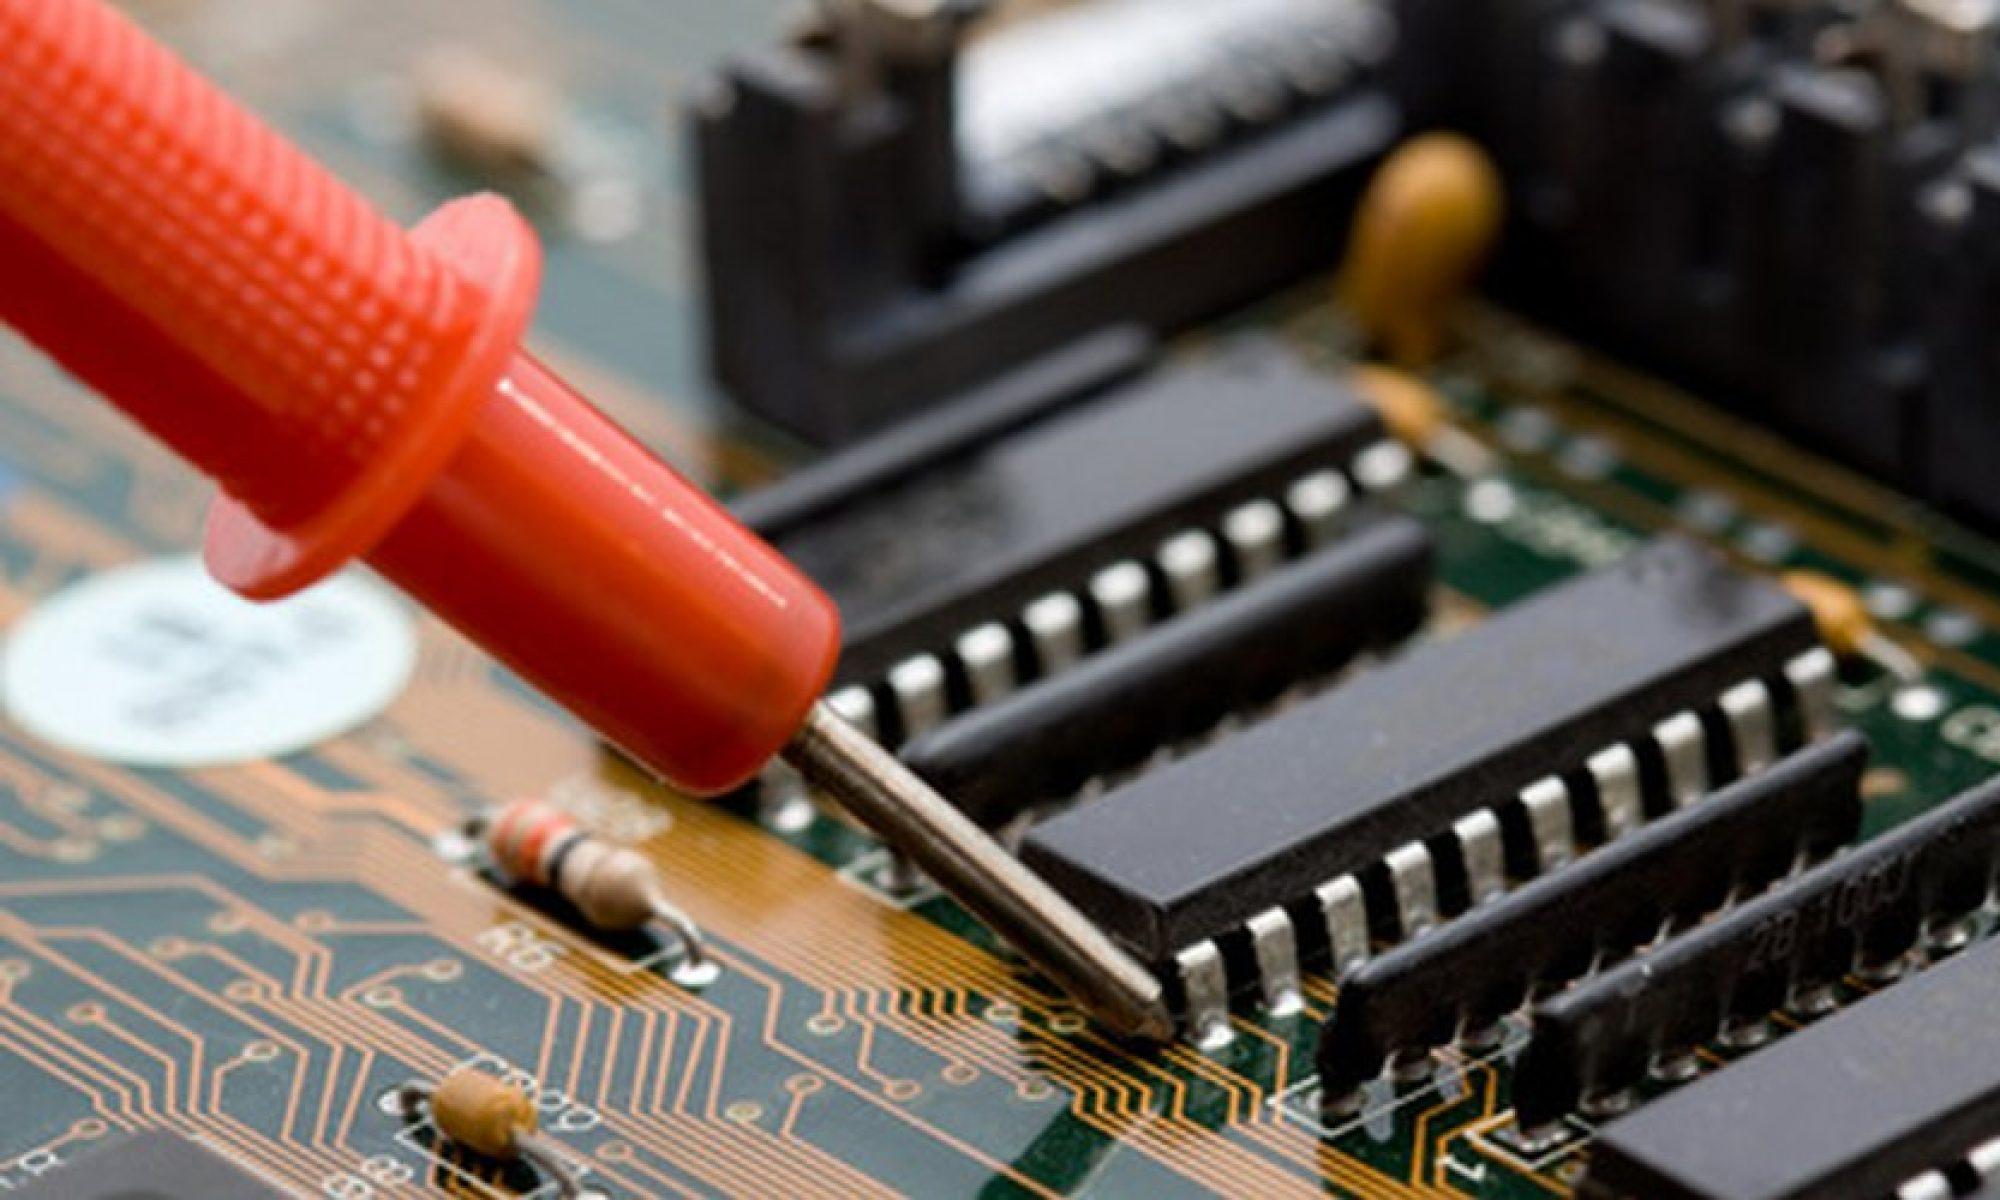 Millspaw Electronics